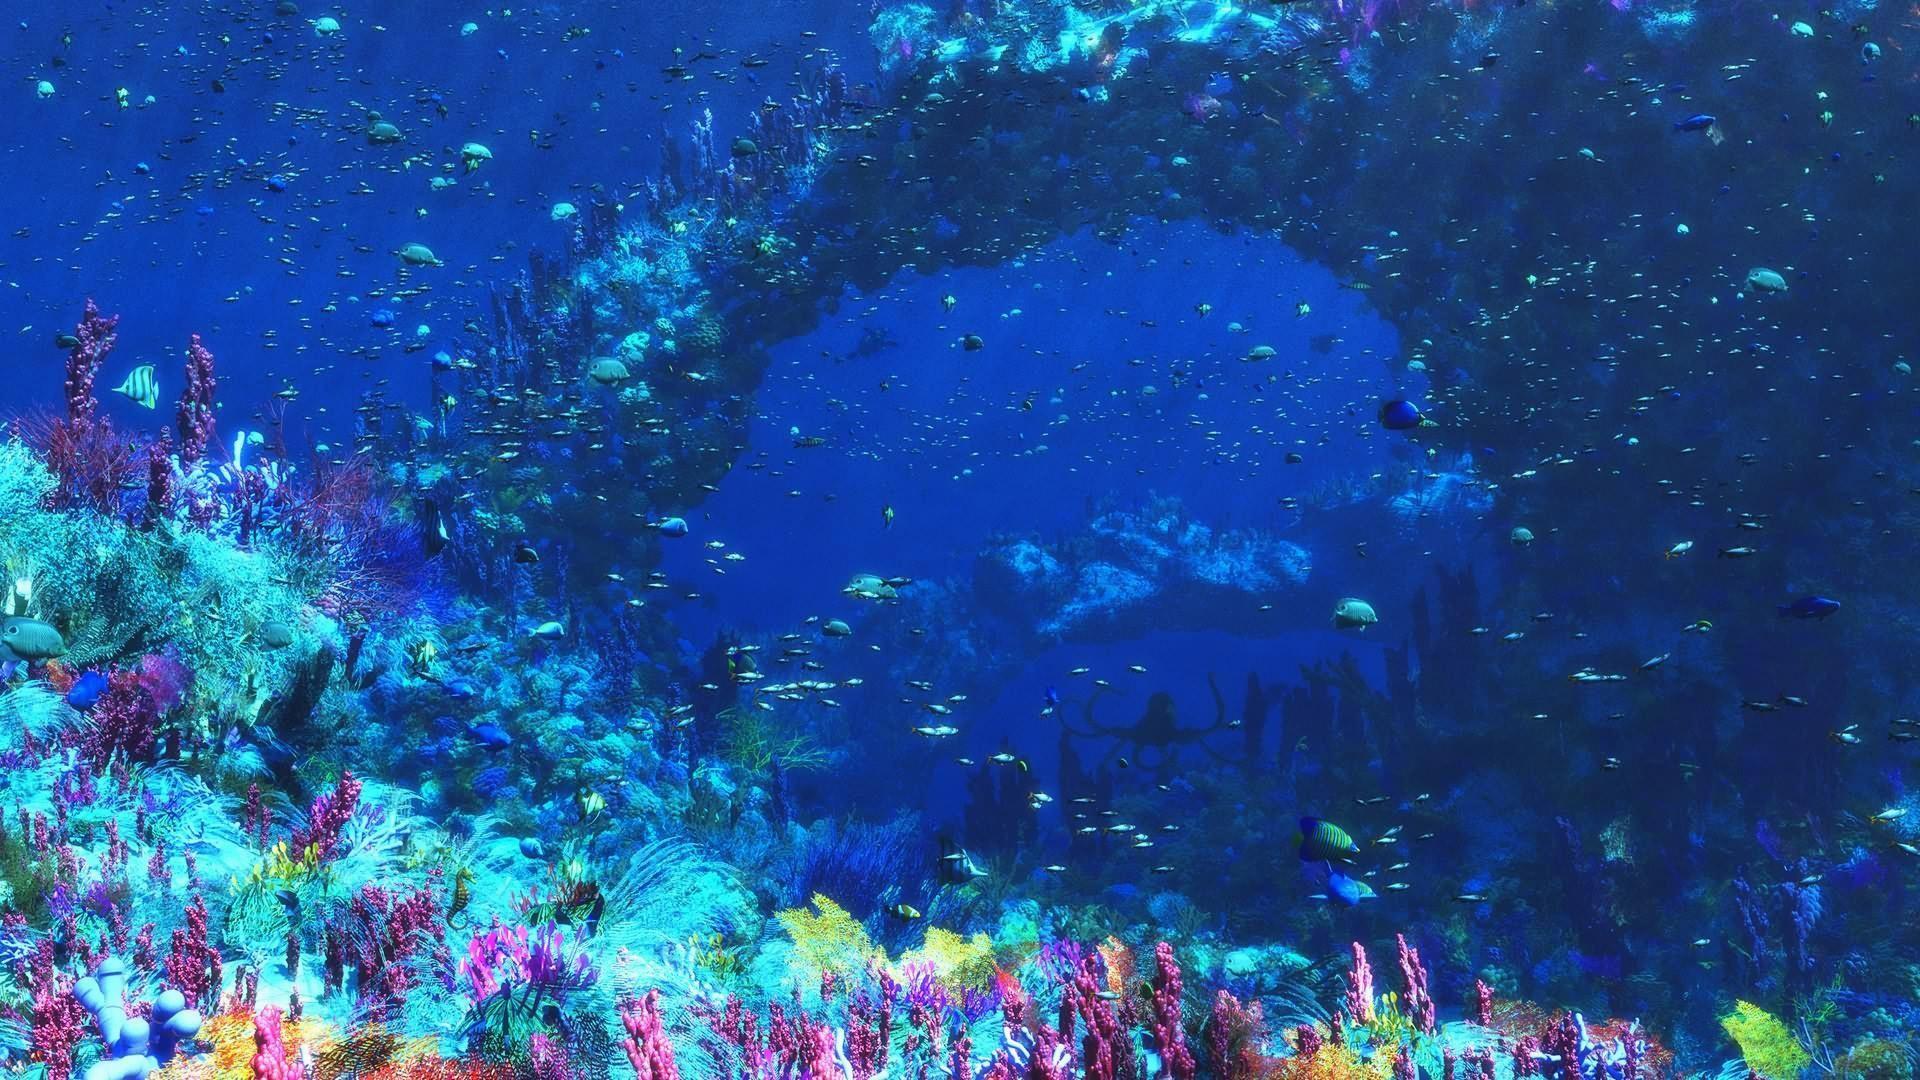 Under Water Wallpaper 1